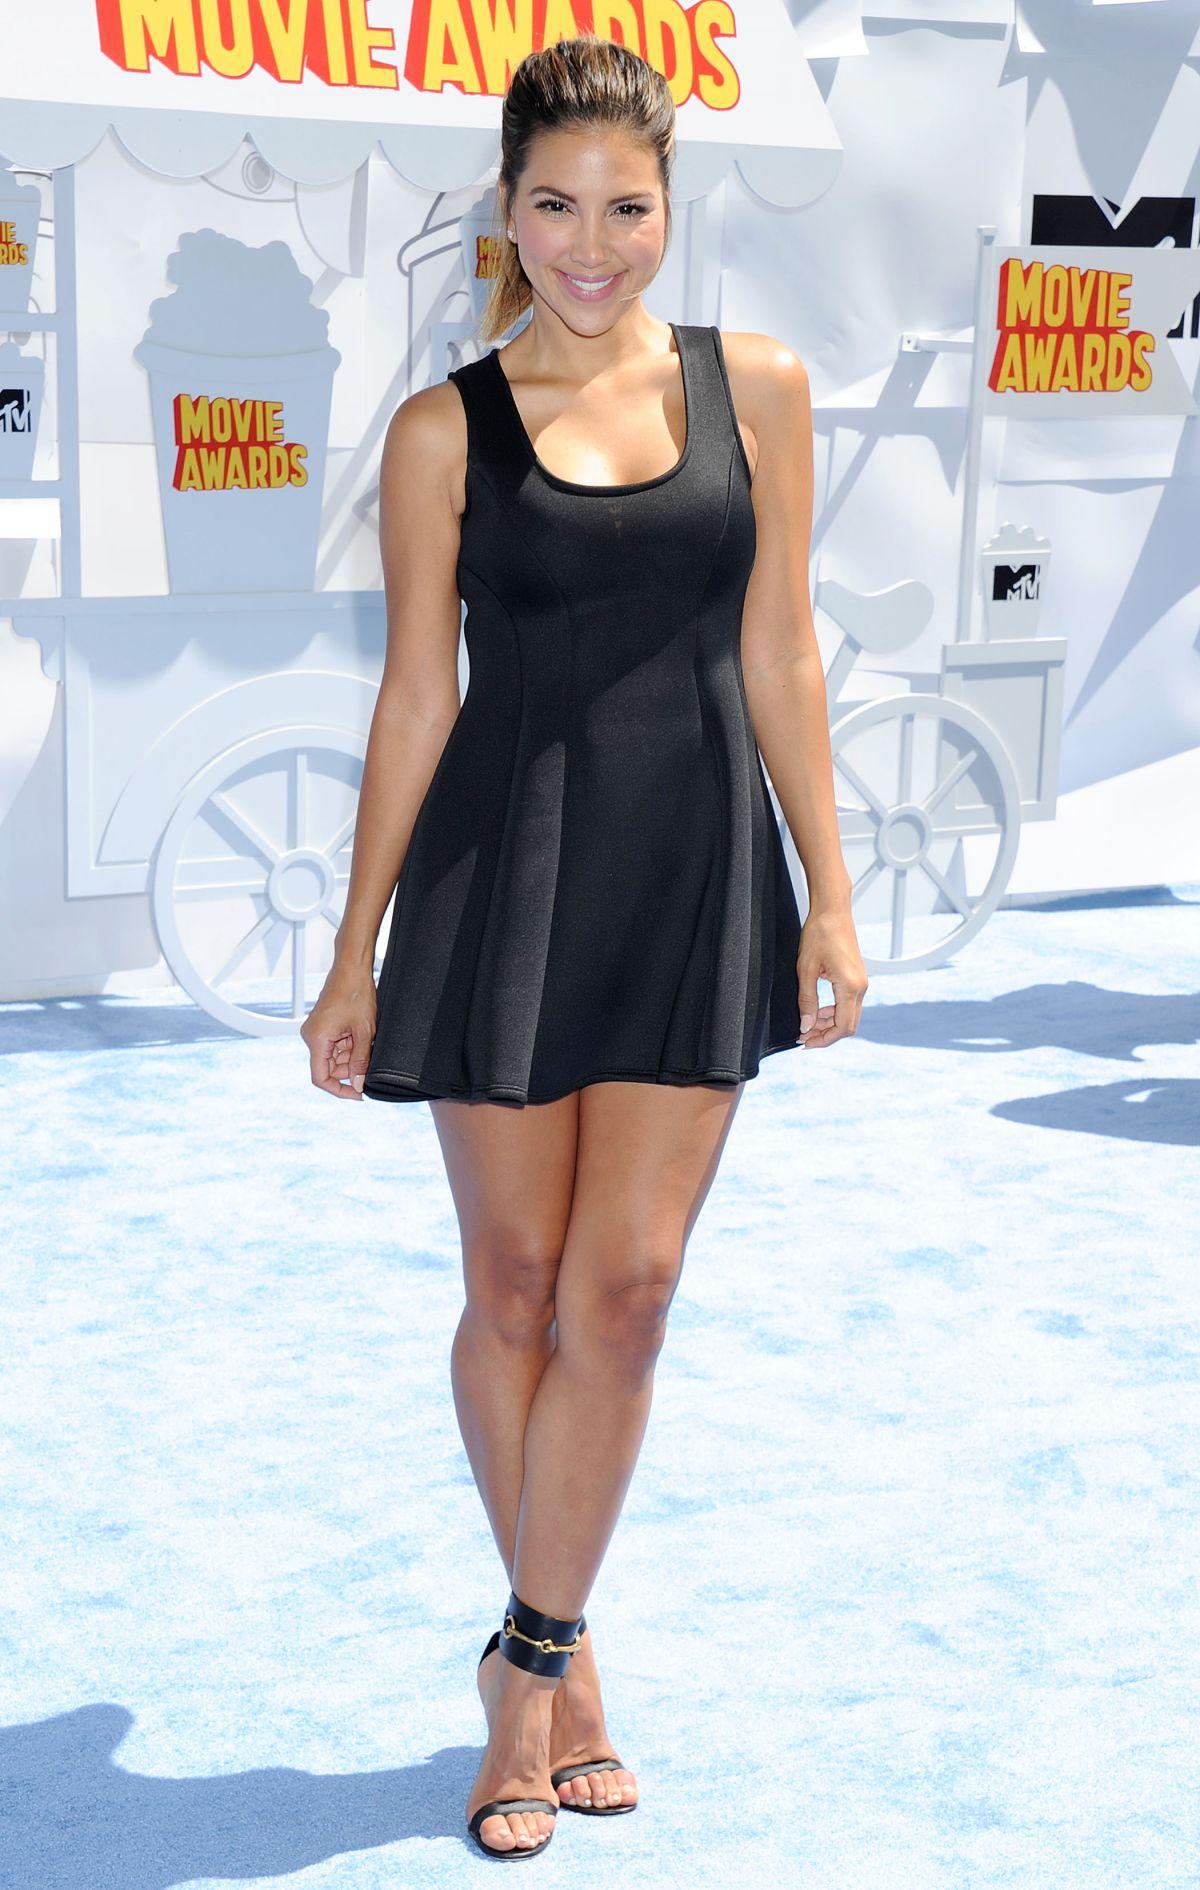 LIZ HERNANDEZ at 2015 MTV Movie Awards in Los Angeles